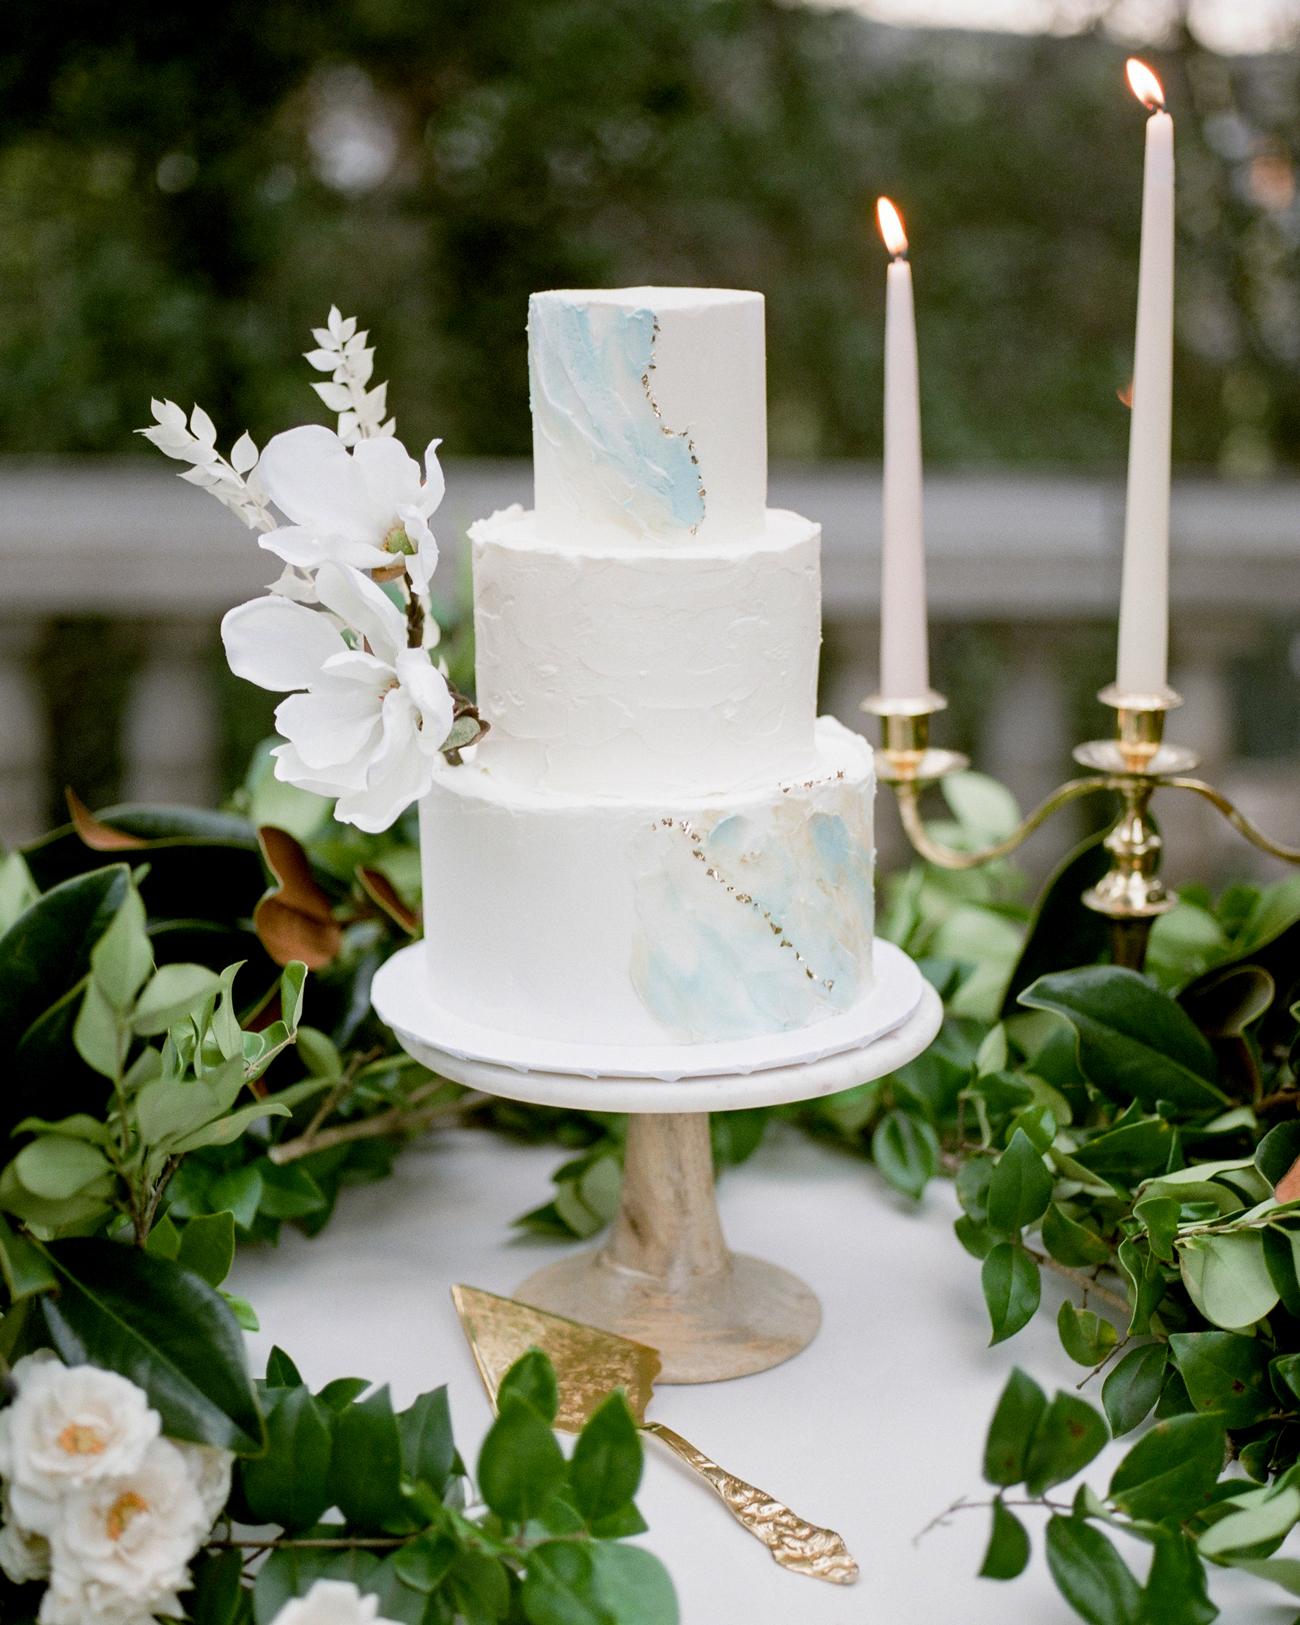 Marbled Tiered wedding cake